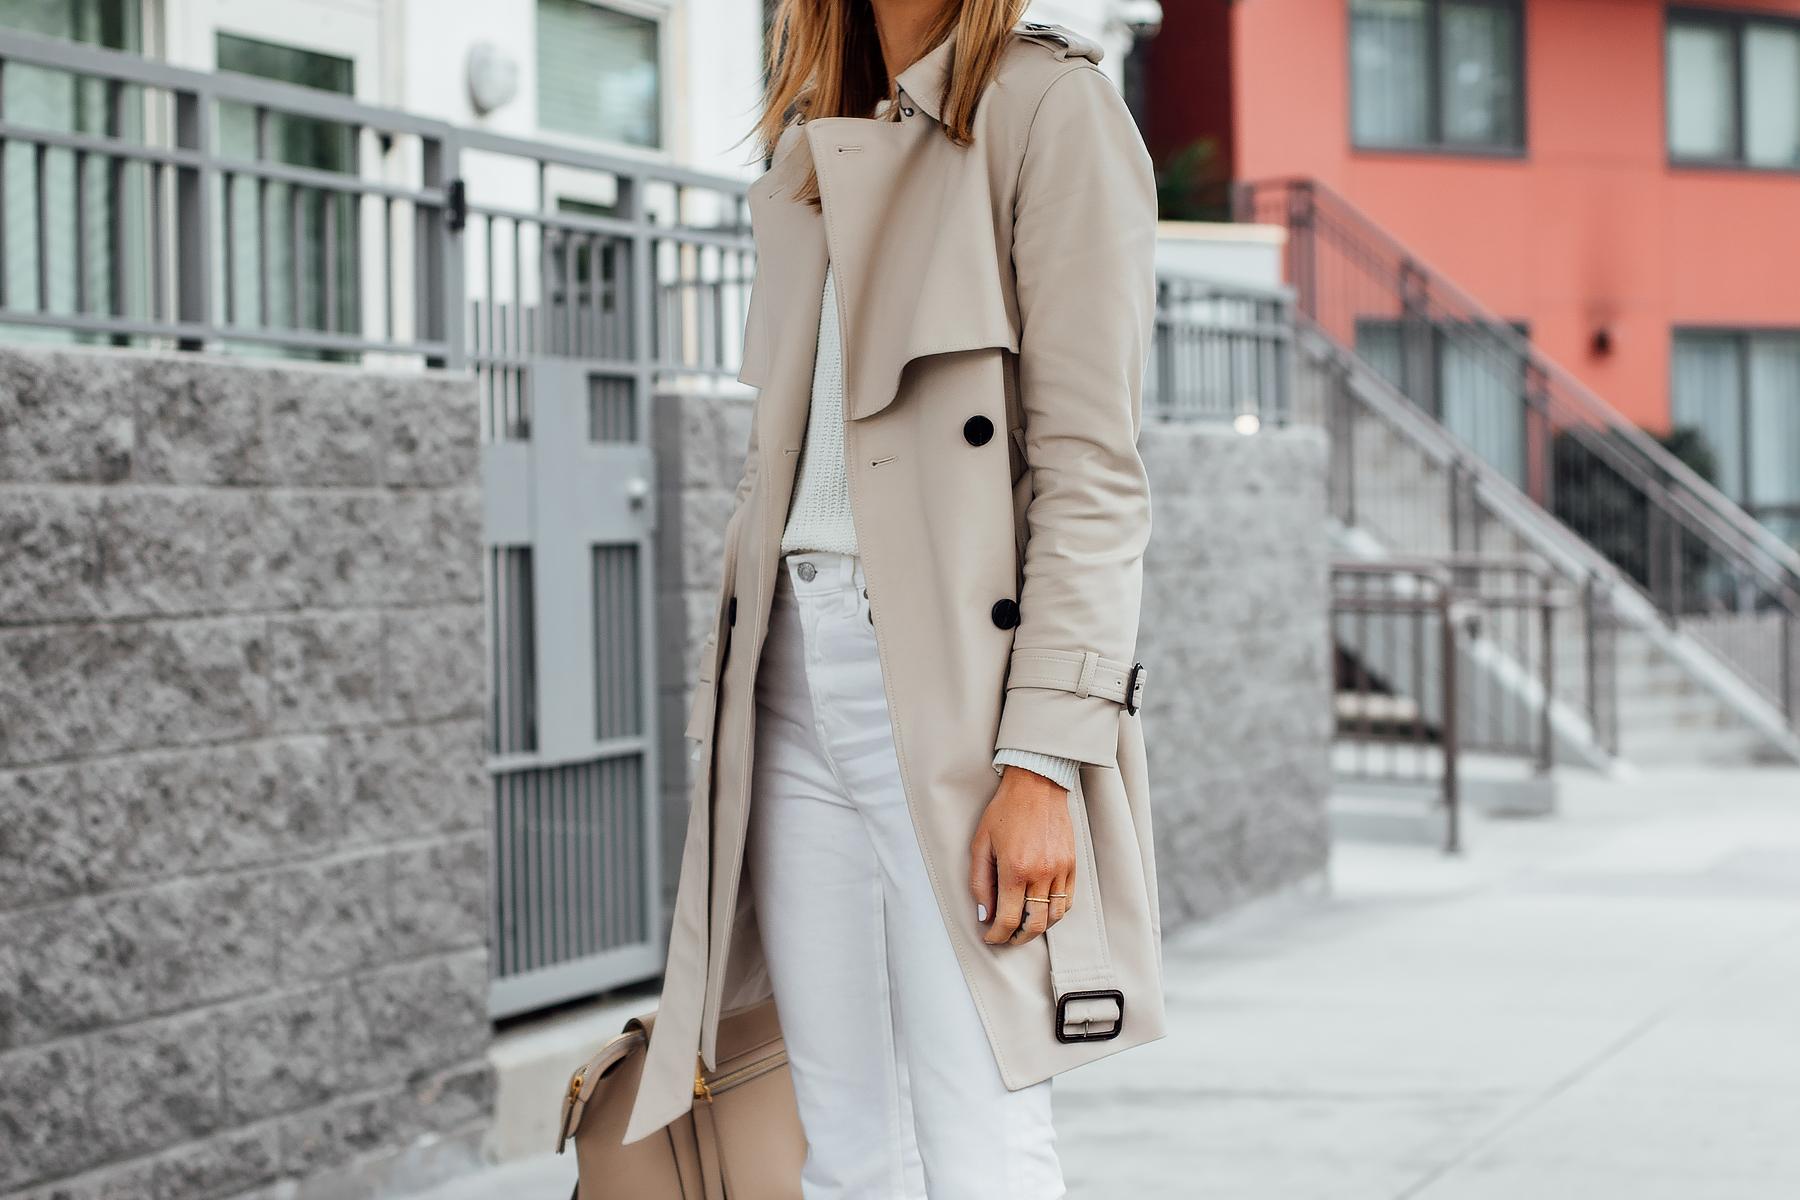 Blonde Woman Wearing Club Monaco Trench Coat White Sweater White Jeans Fashion Jackson San Diego Fashion Blogger Street Style